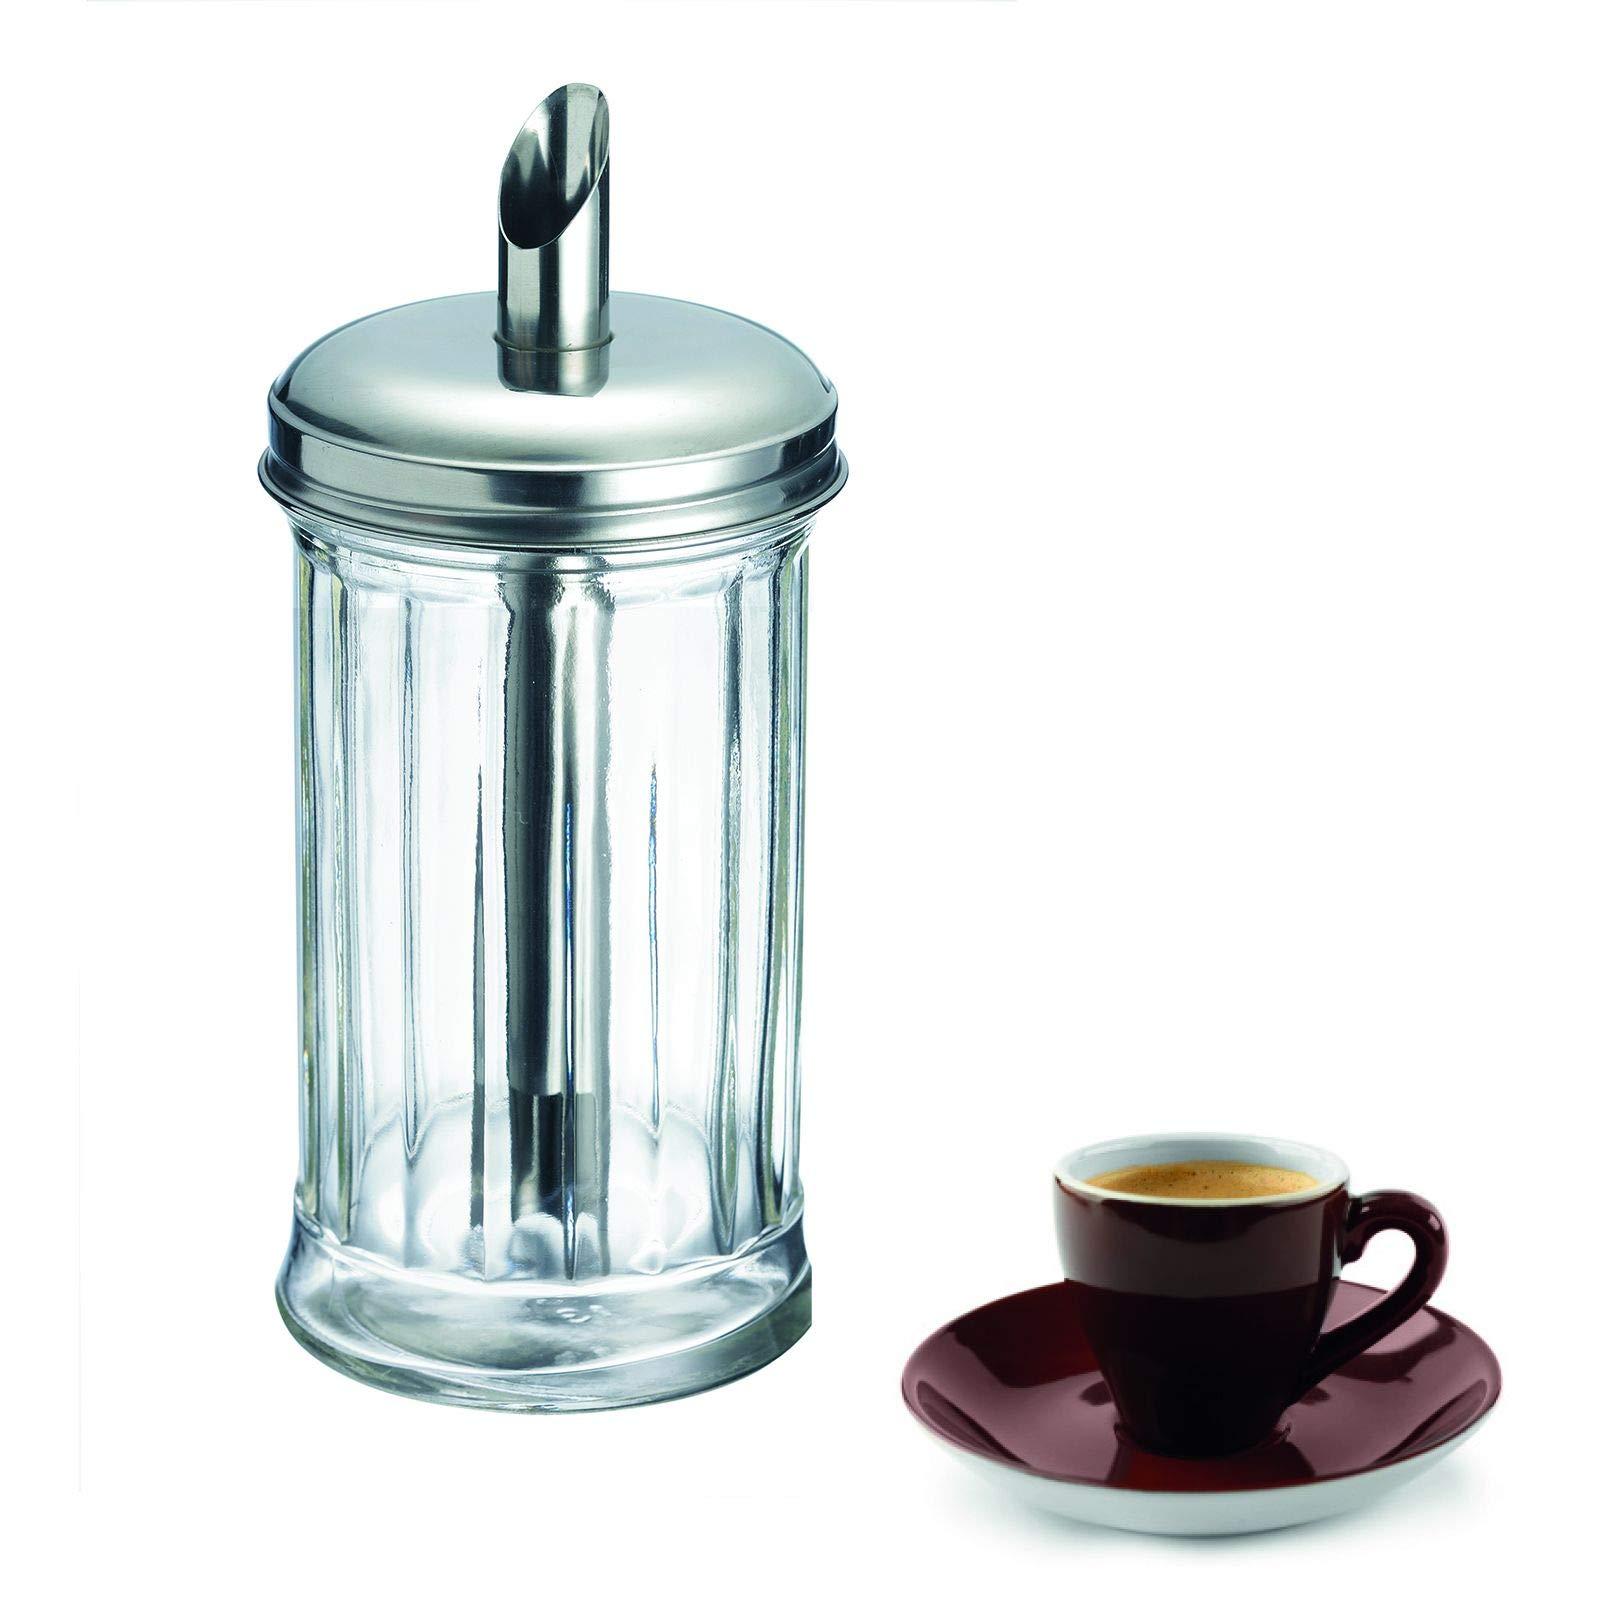 Westmark Germany 'New York' Glass Sugar Dispenser, Stainless Steel by Westmark